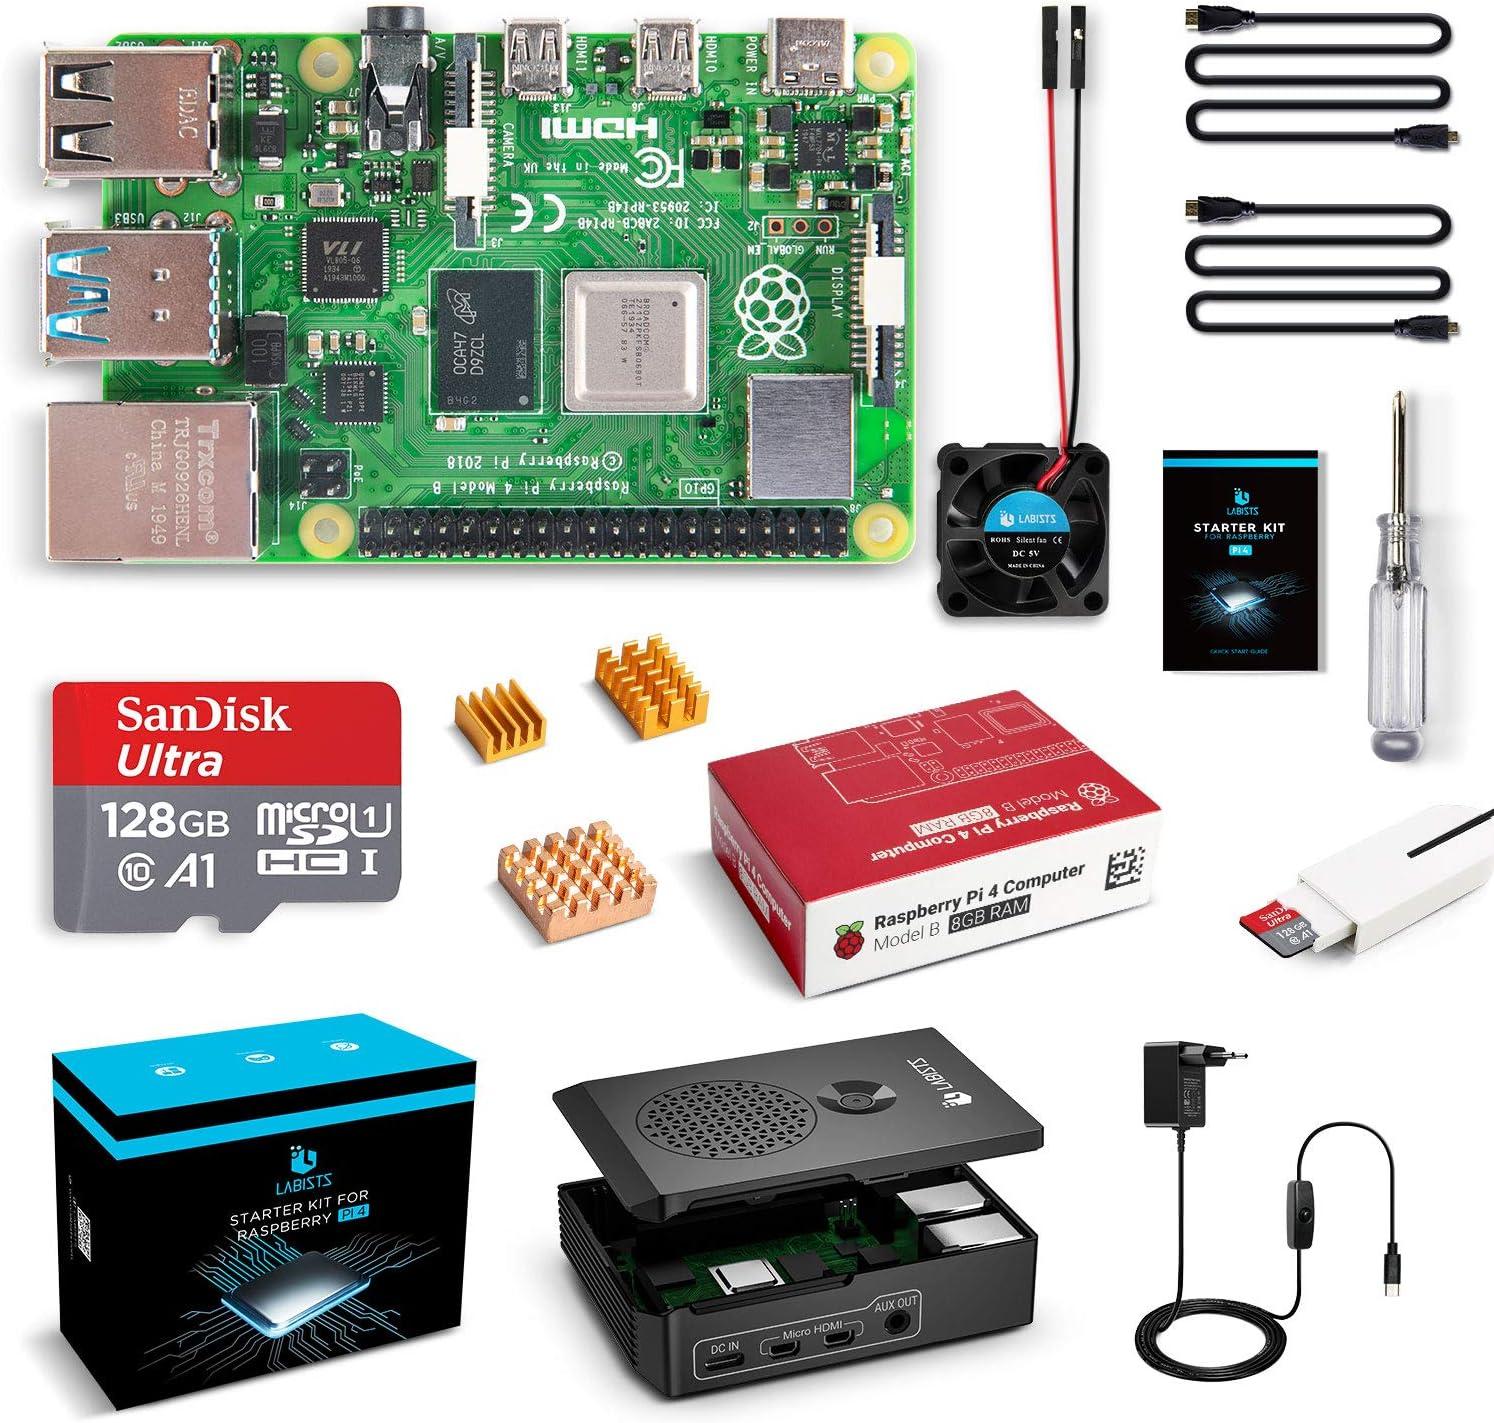 LABISTS Raspberry Pi 4 8GB Kit Incluido Tarjeta SD 128GB Precargada con Raspberry Pi OS, Ventilador, 3 Disipadores de Calor, 2 Micro HDMI, Caja y Lector de Tarjetas